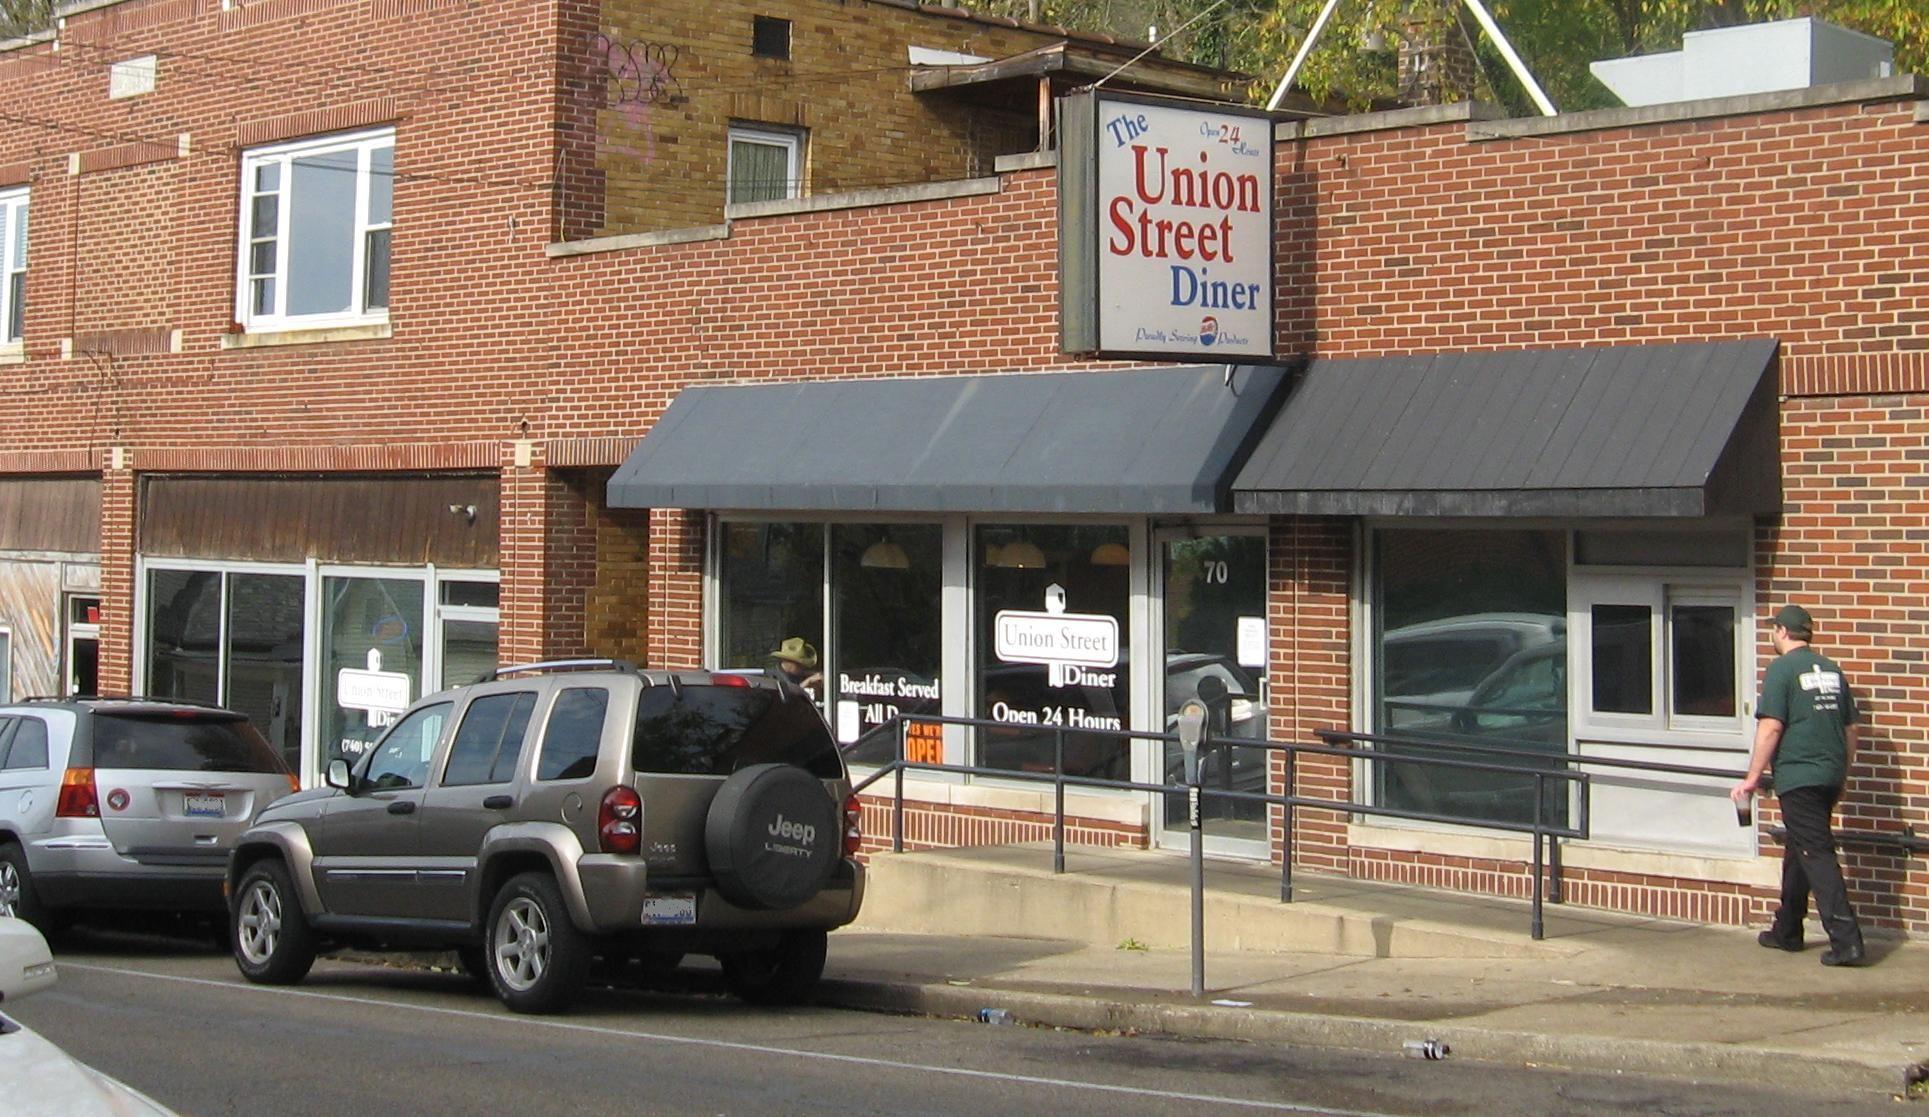 Union Street Diner Athens Ohio Union Diner